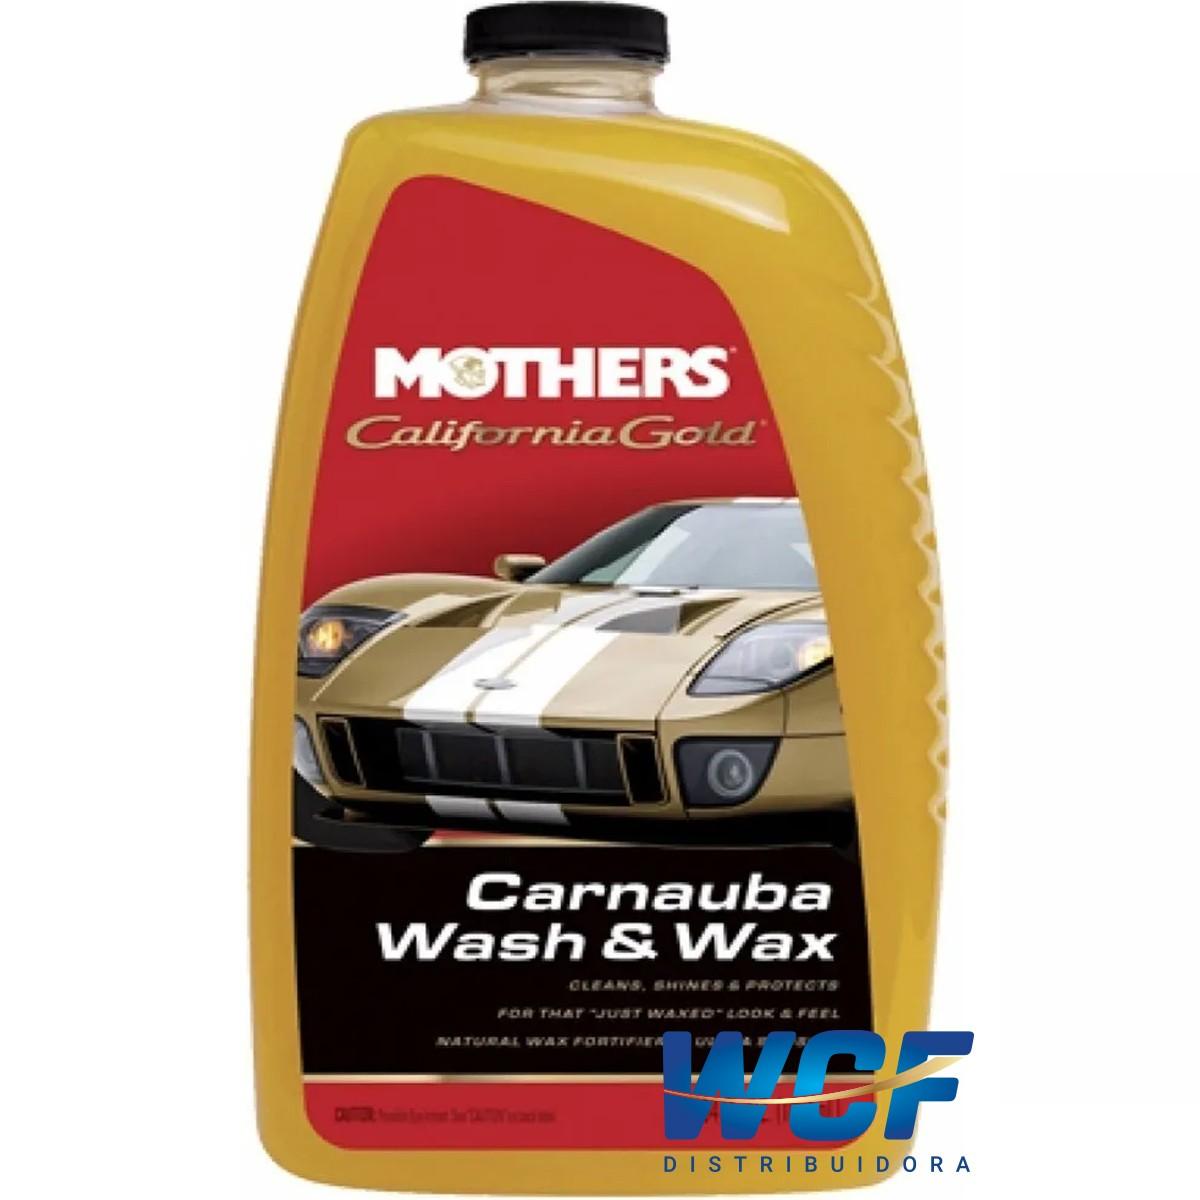 SHAMPOO DE CARNAUBA AUTOMOTIVO WASH E WAX MOTHERS 1800ML